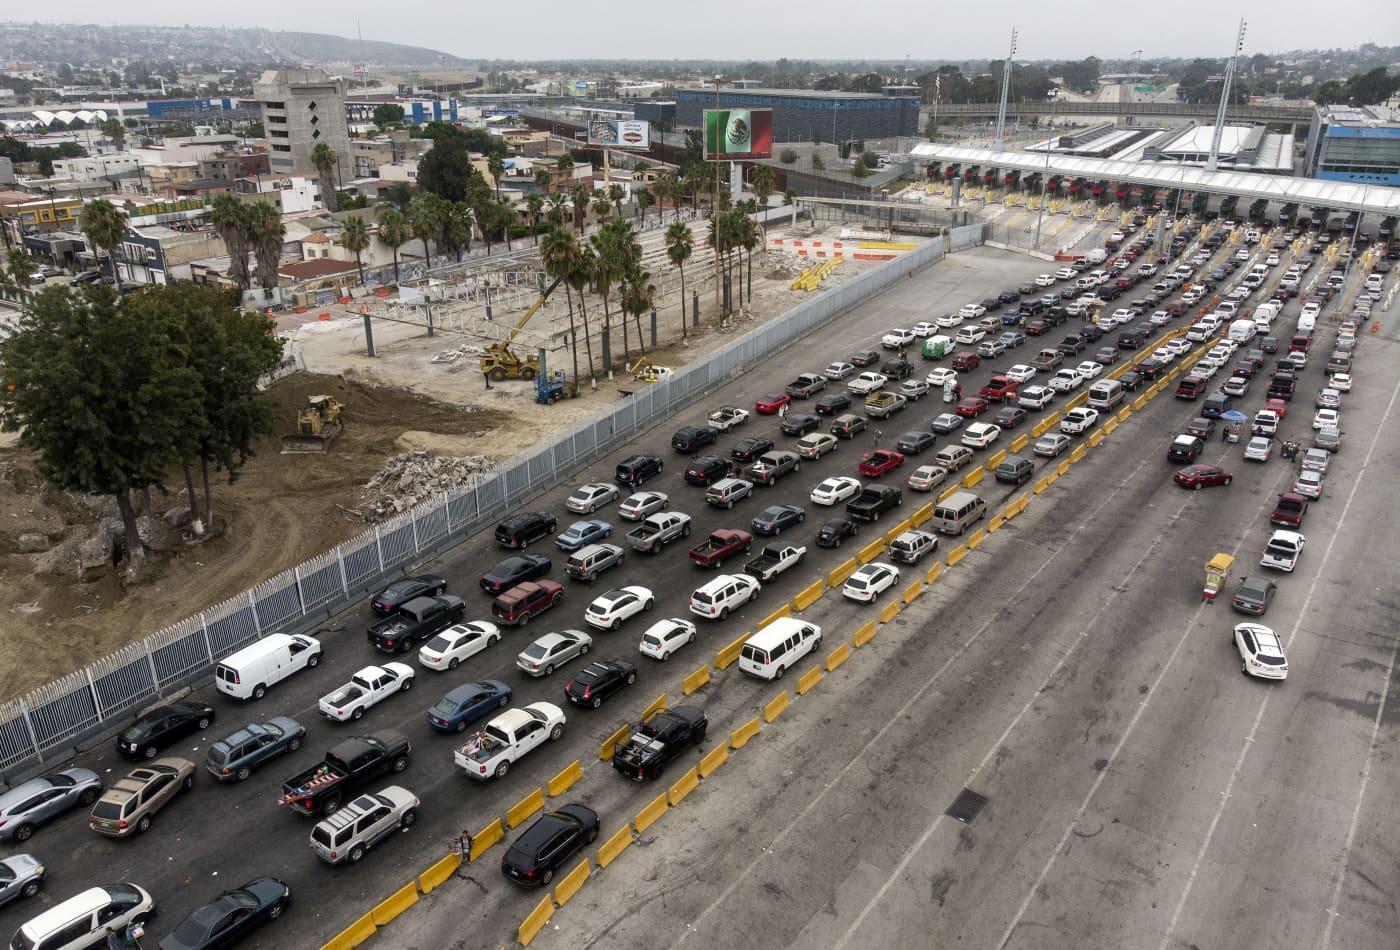 Coronavirus live updates: North America extends border closures; Israel in lockdown; Europe faces second wave